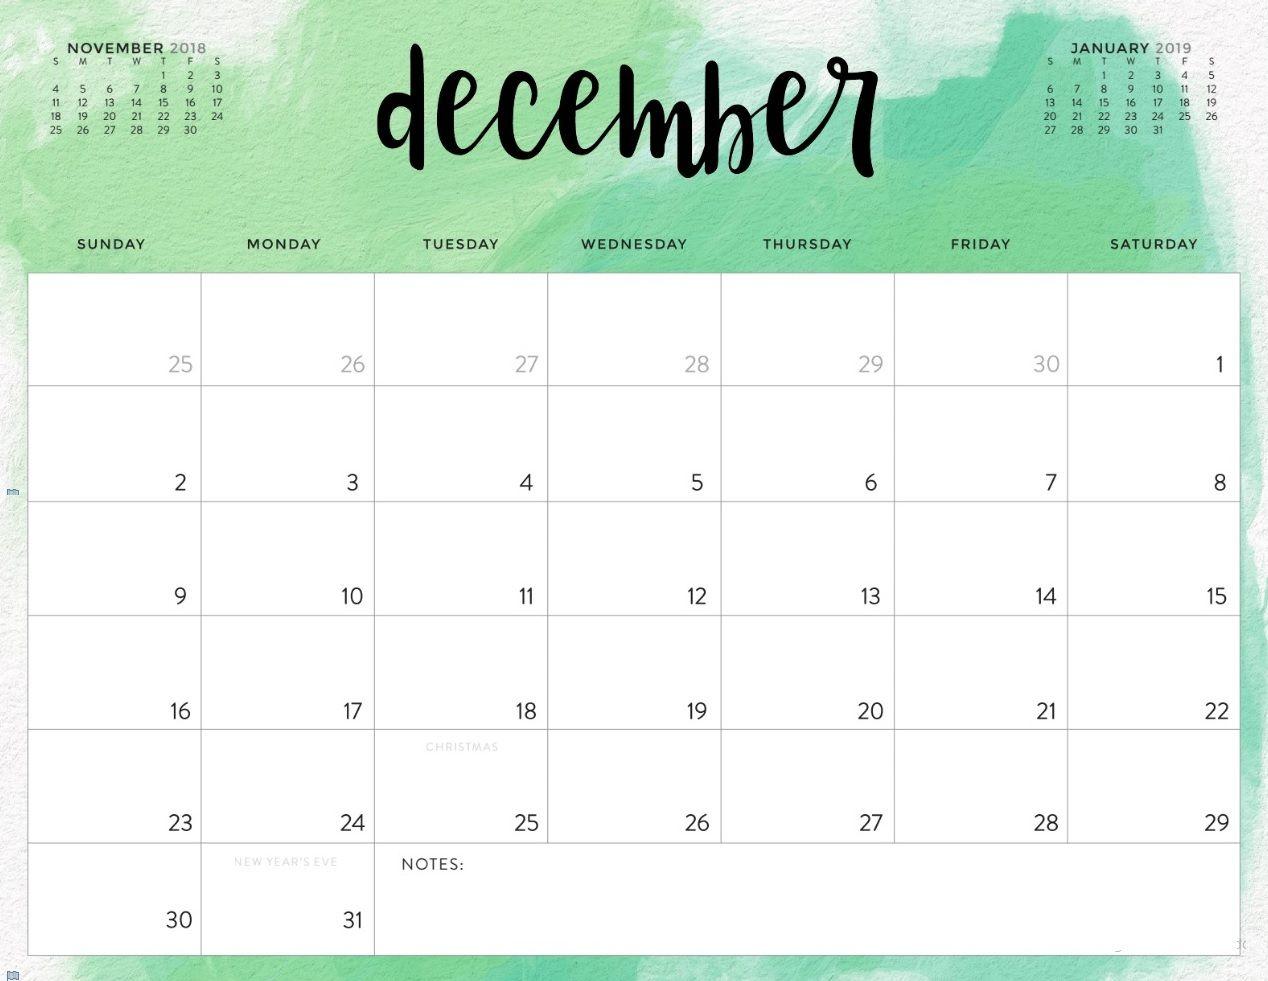 Printable December 2018 Calendar | Calendar 2018 | December Calendar throughout Christmas Themed Calendar Templates